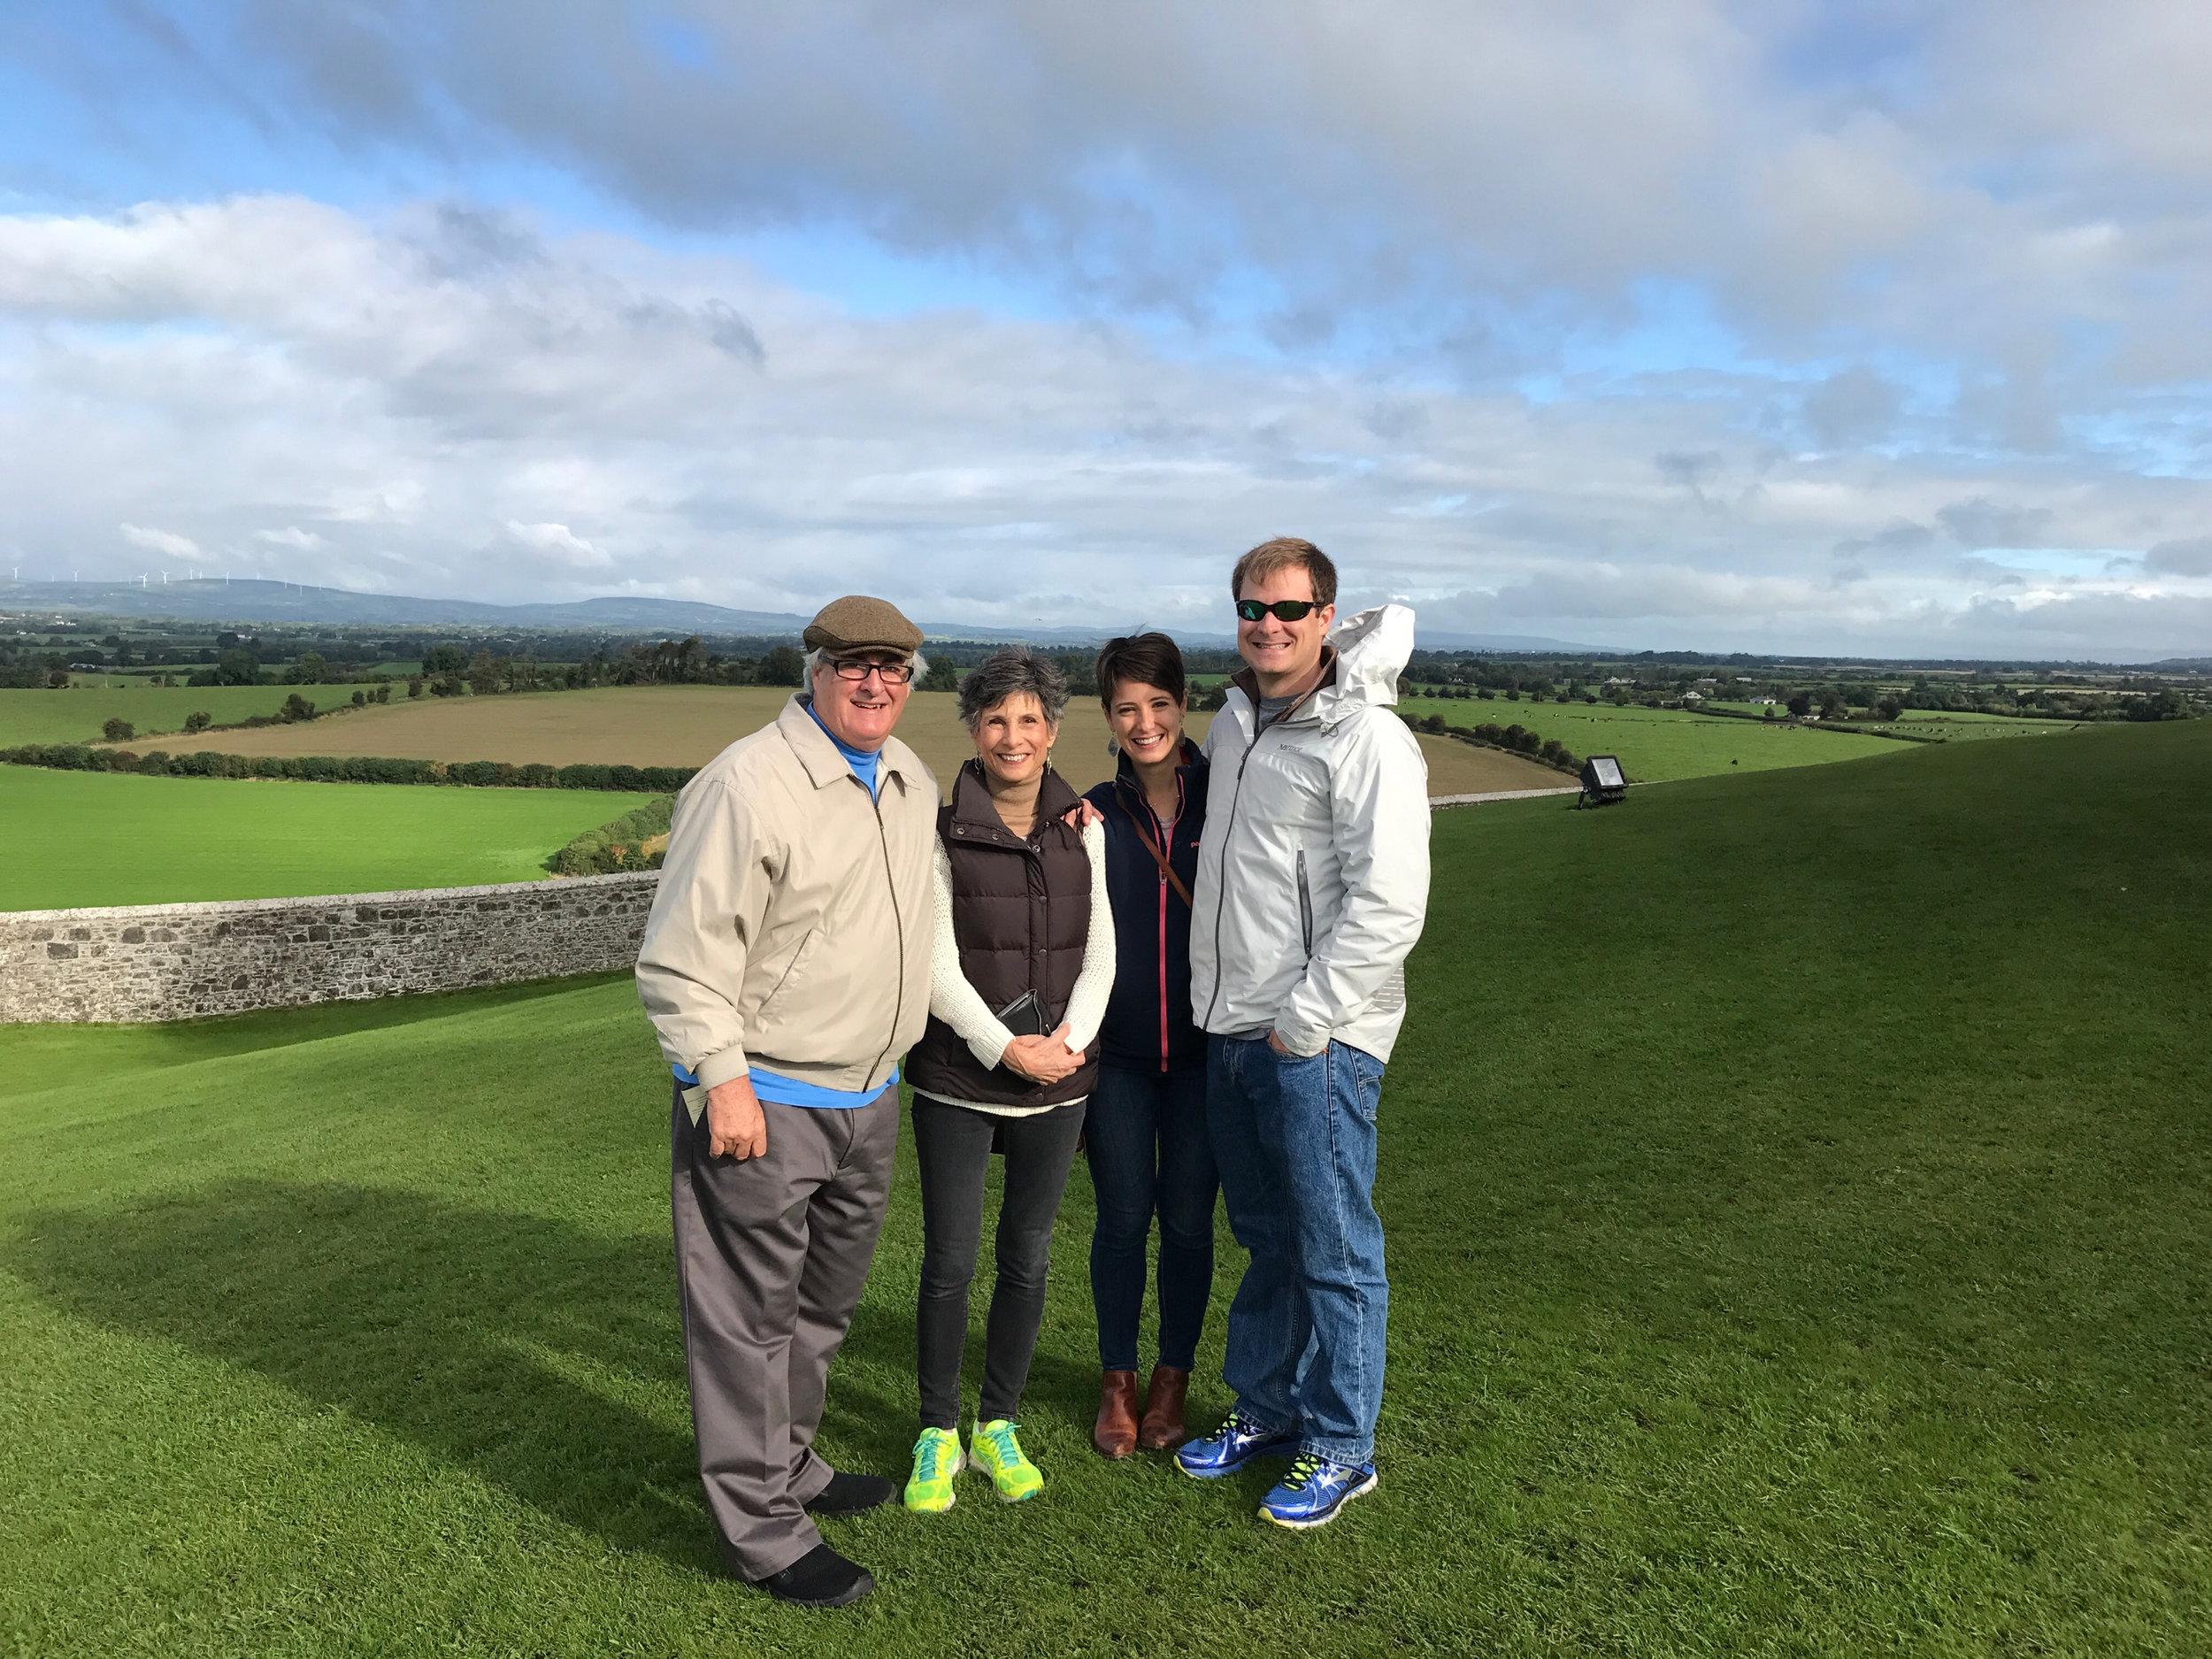 IRELAND - September 2017